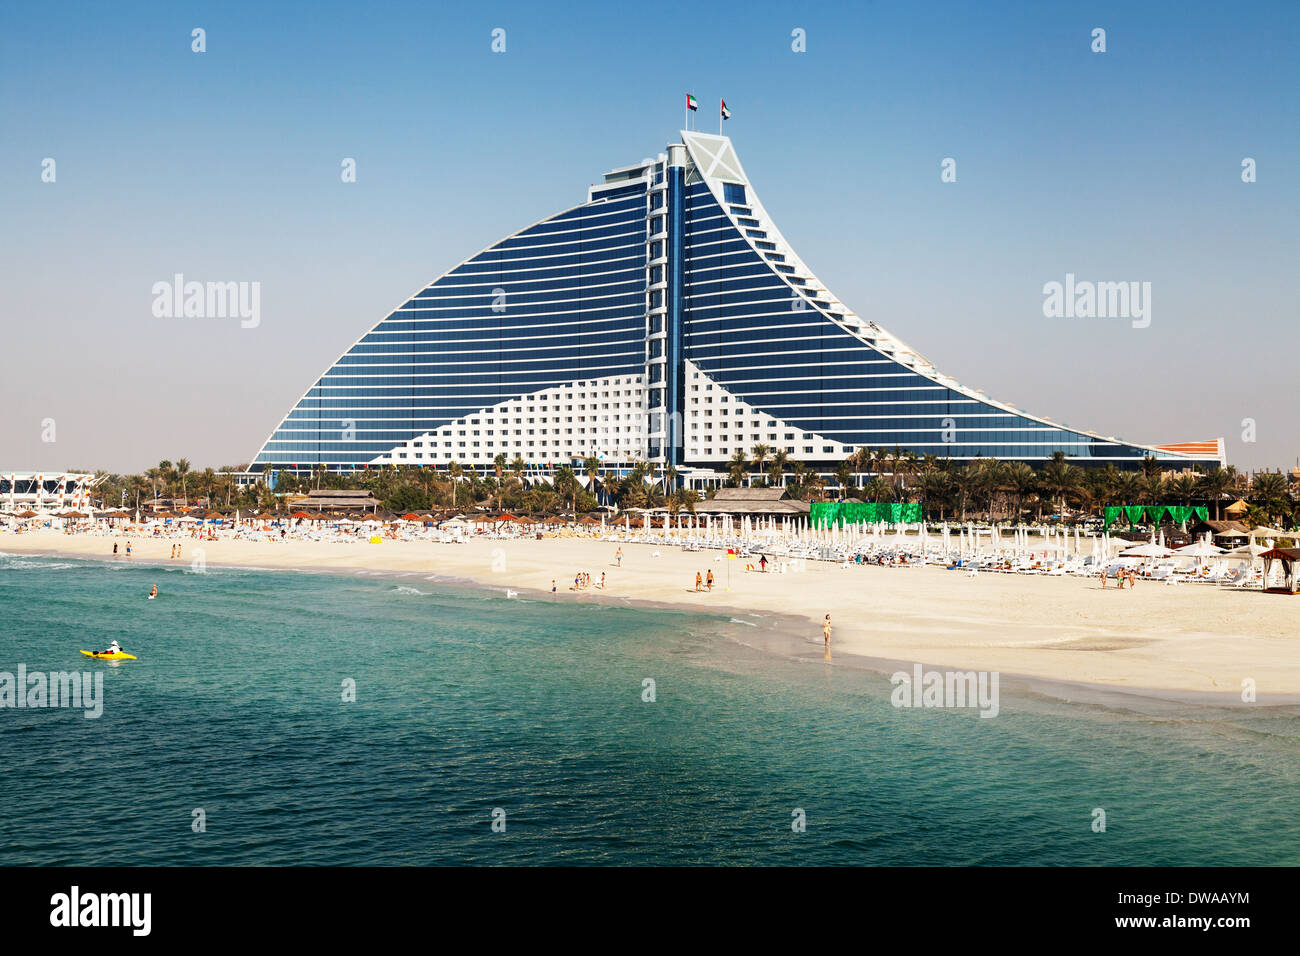 The Jumeirah Beach Hotel Dubai A Luxury 5 Star Hotel Dubai Uae Stock Photo Alamy